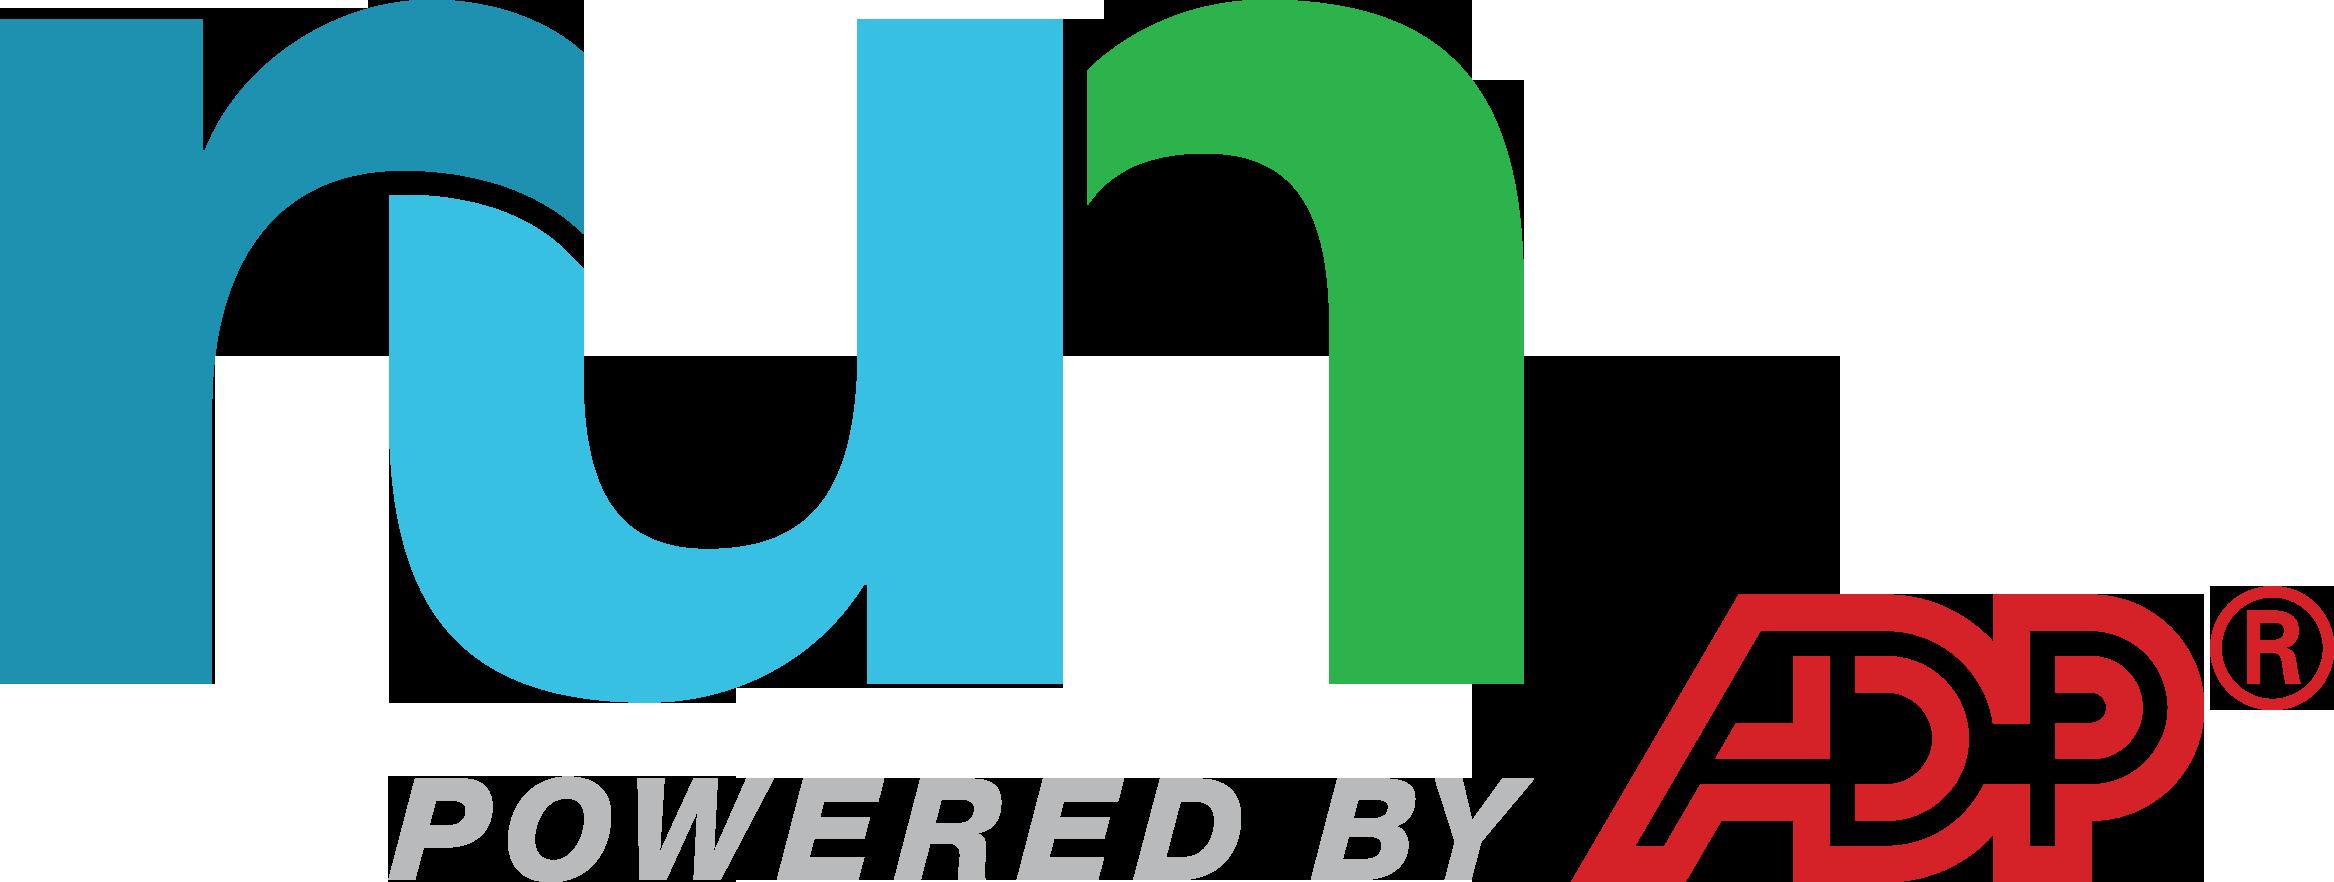 RUN Powered by ADP logo